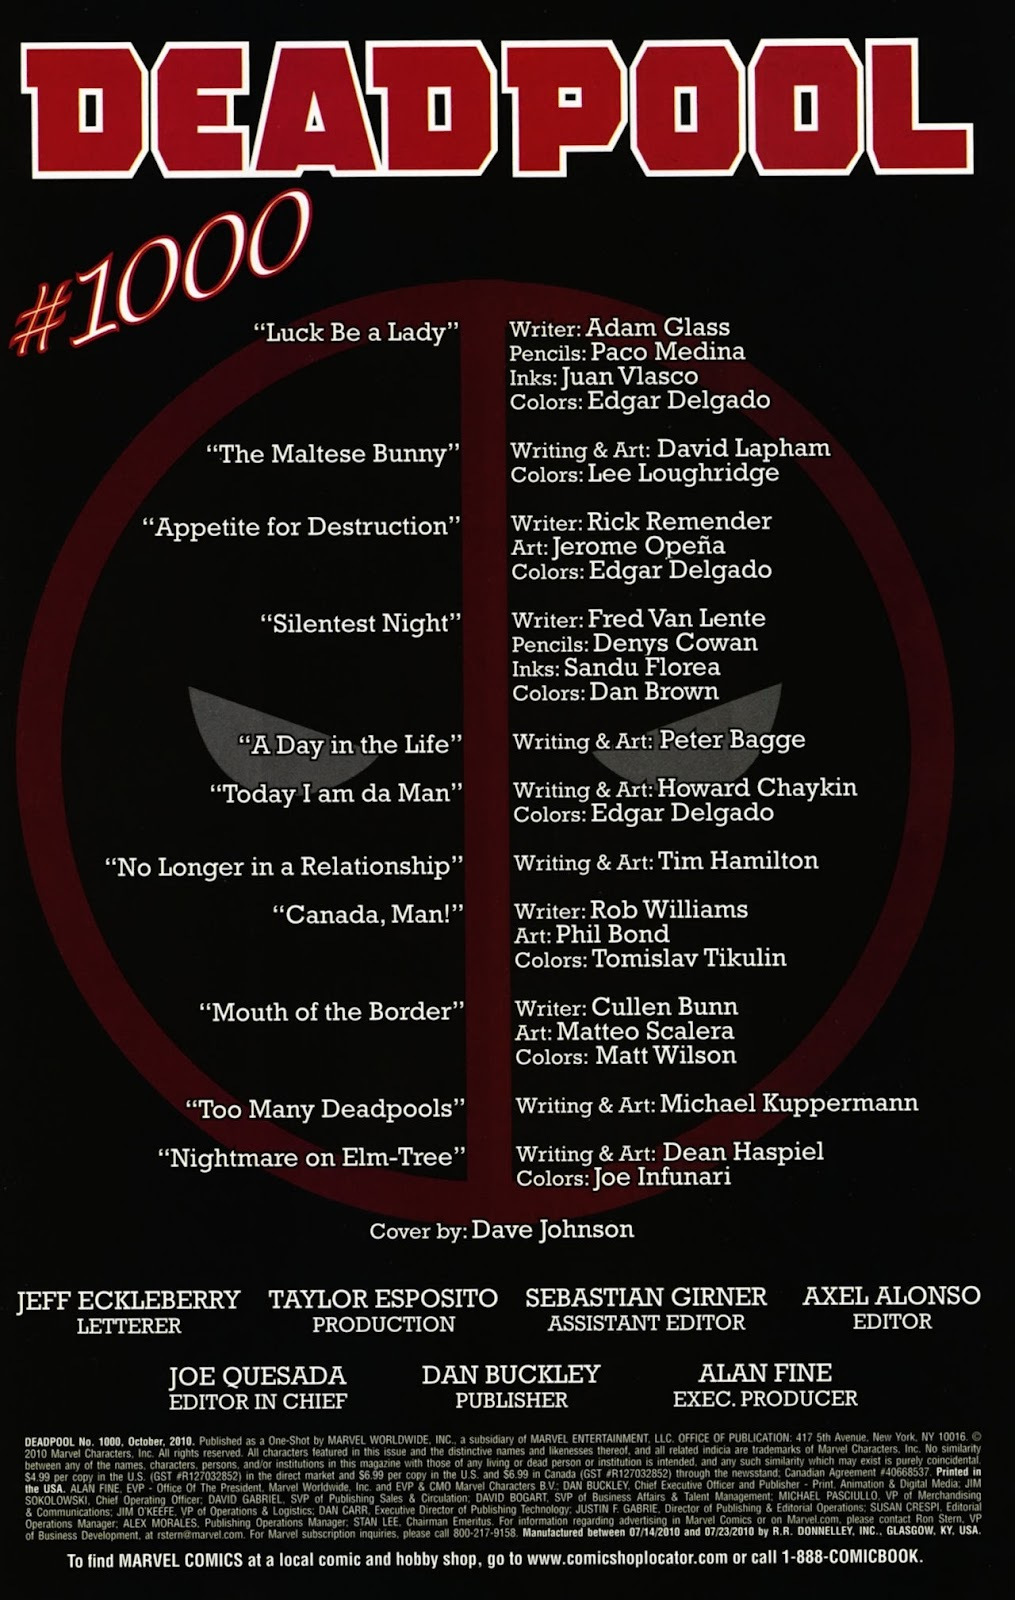 Read online Deadpool (2008) comic -  Issue #1000 - 3